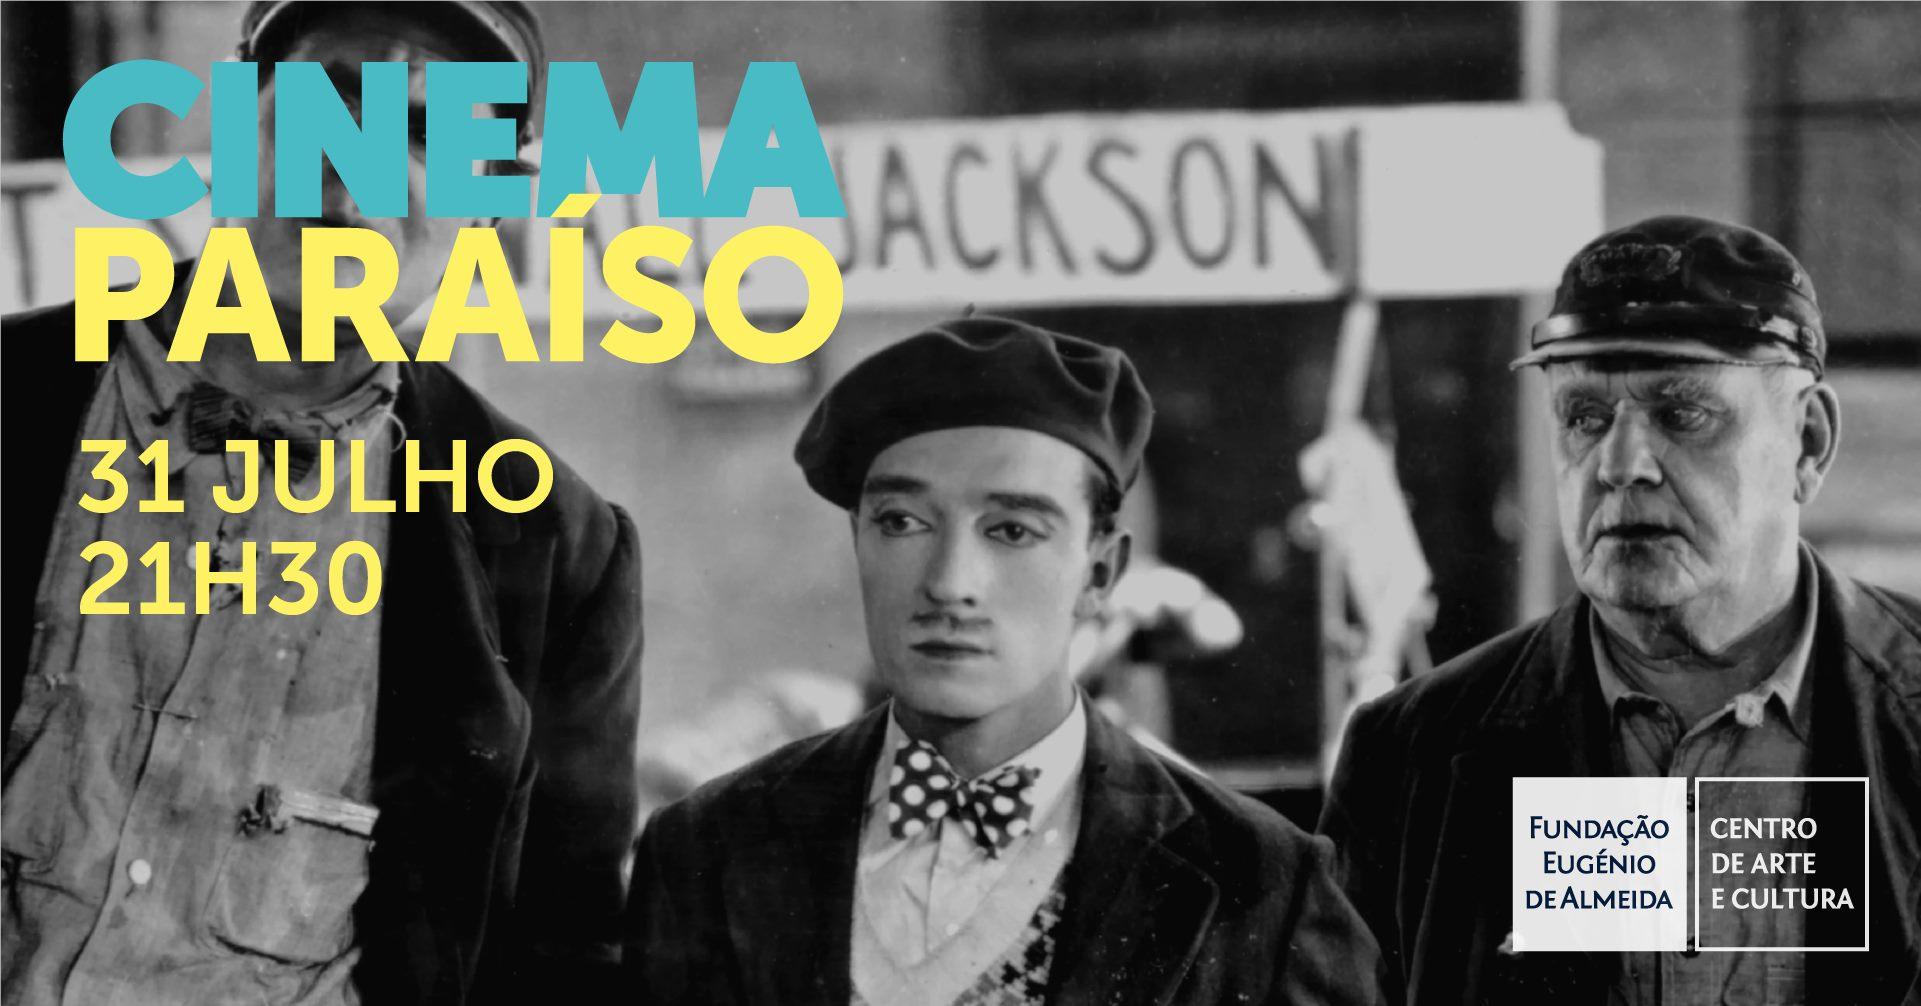 Filipe Raposo toca piano para Buster Keaton